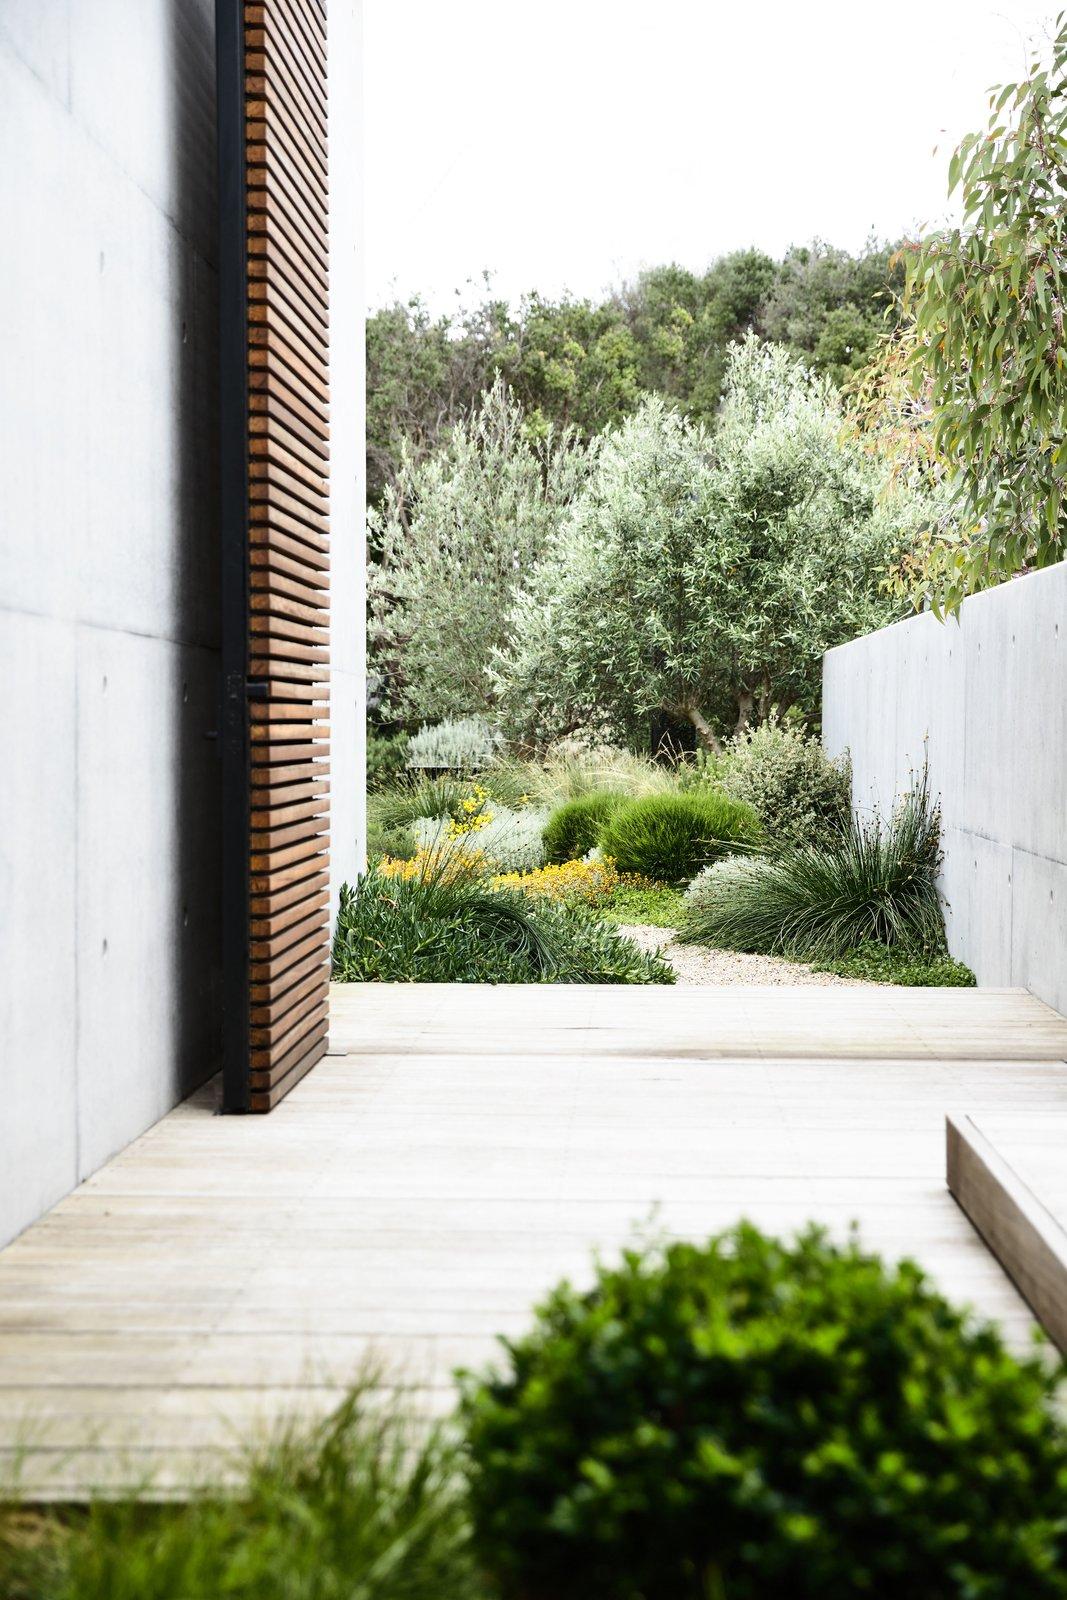 House Building Type, Concrete Siding Material, Wood Siding Material, and Beach House Building Type  DS House, Blairgowrie